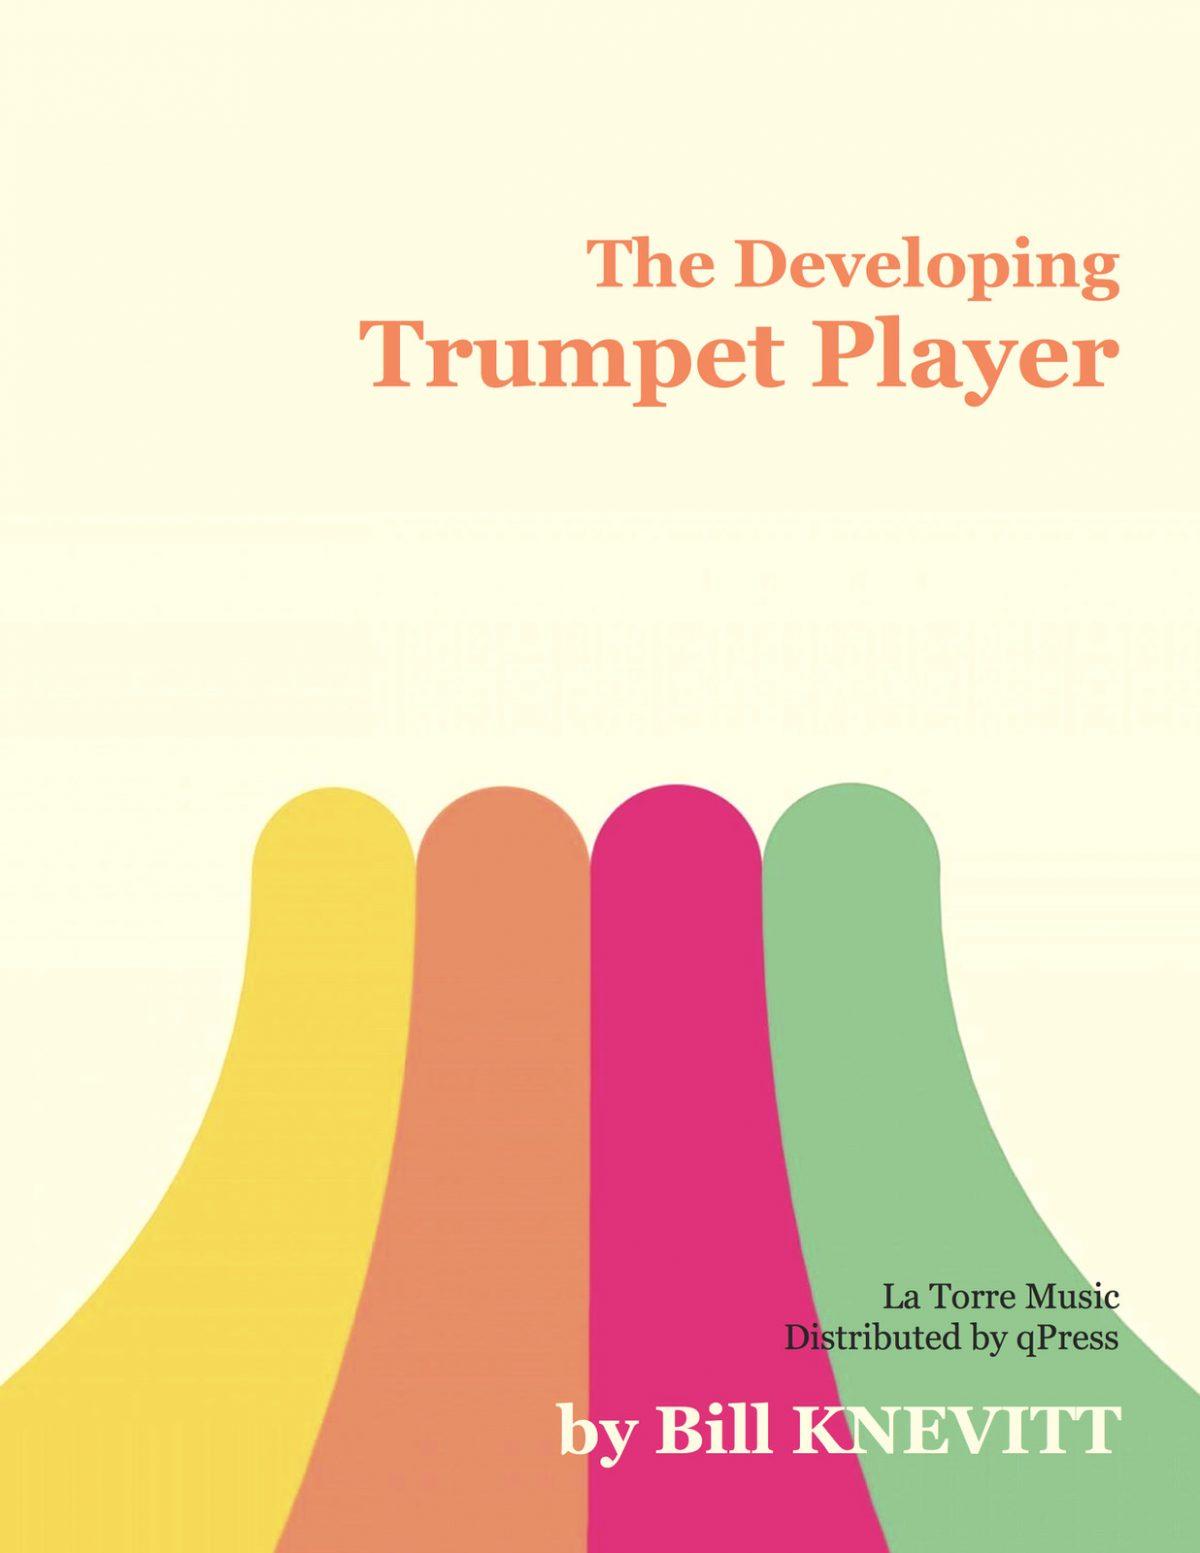 knevitt-developing-trumpet-player